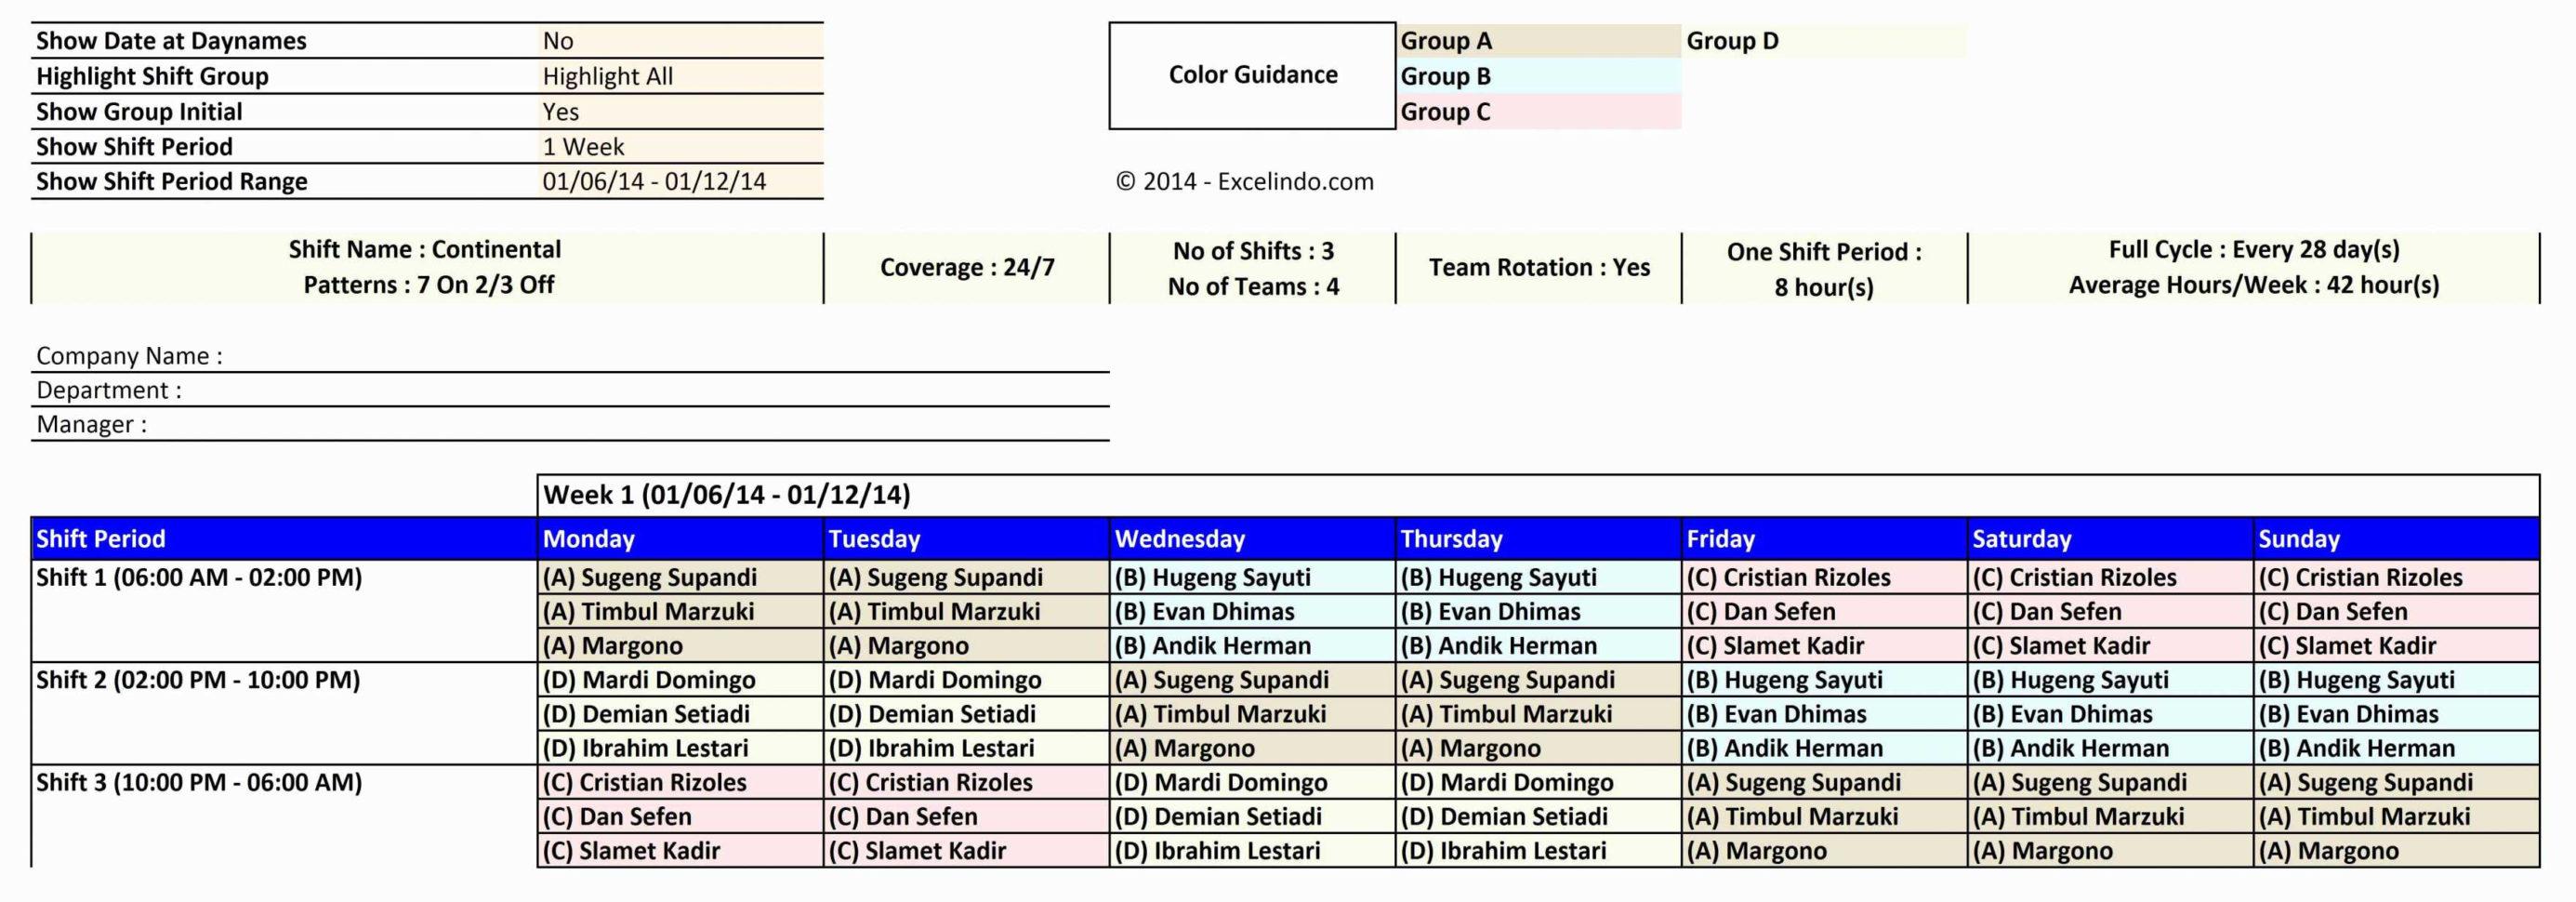 Project Management Spreadsheet Google Docs Project Management Google In Project Management Spreadsheet Google Docs